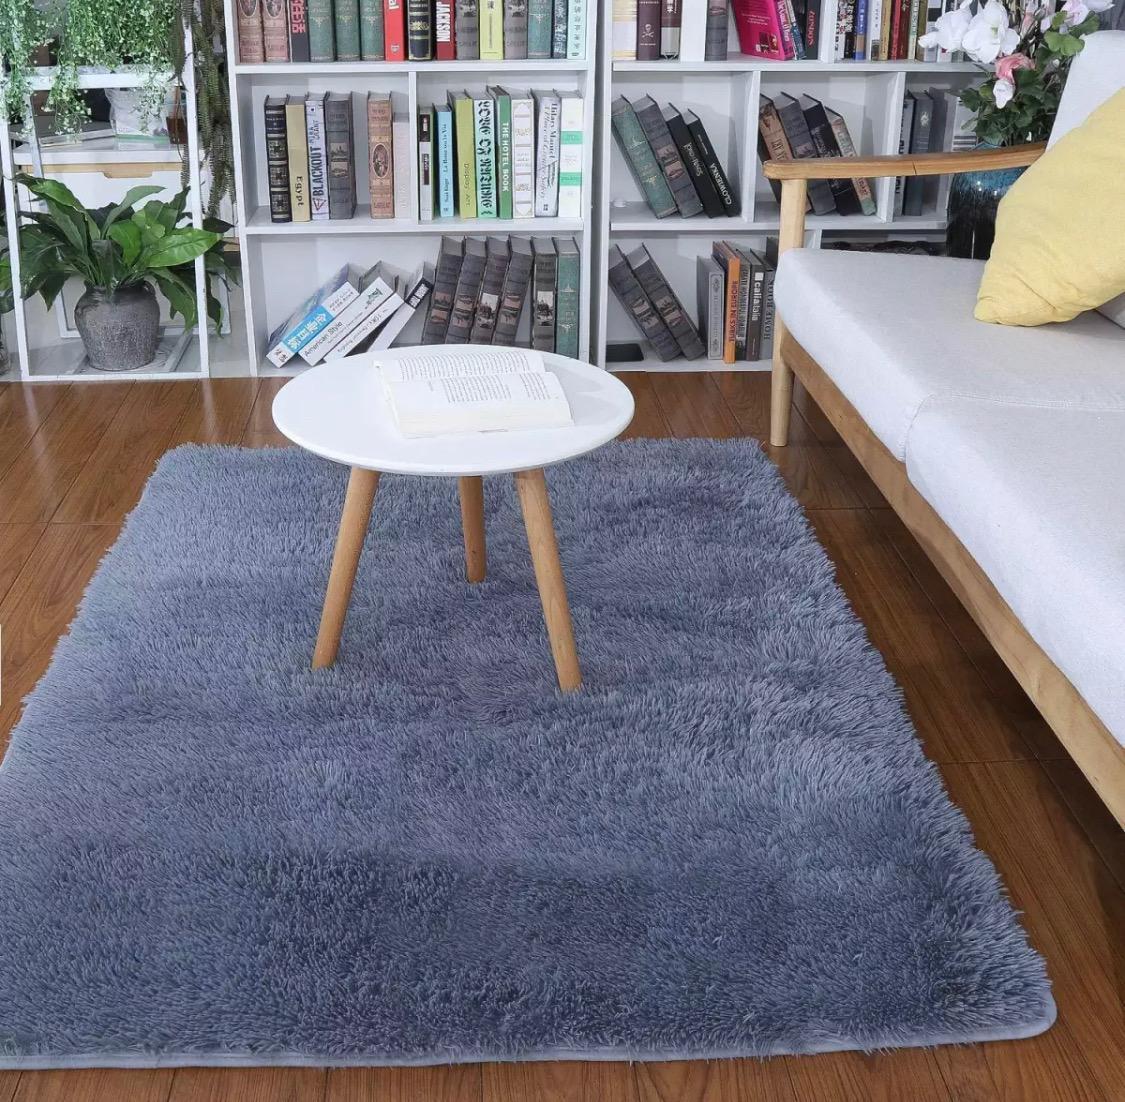 papryllia – karpet bulu ukuran 150x100cm tebal 2cm + busa ( abu – abu )